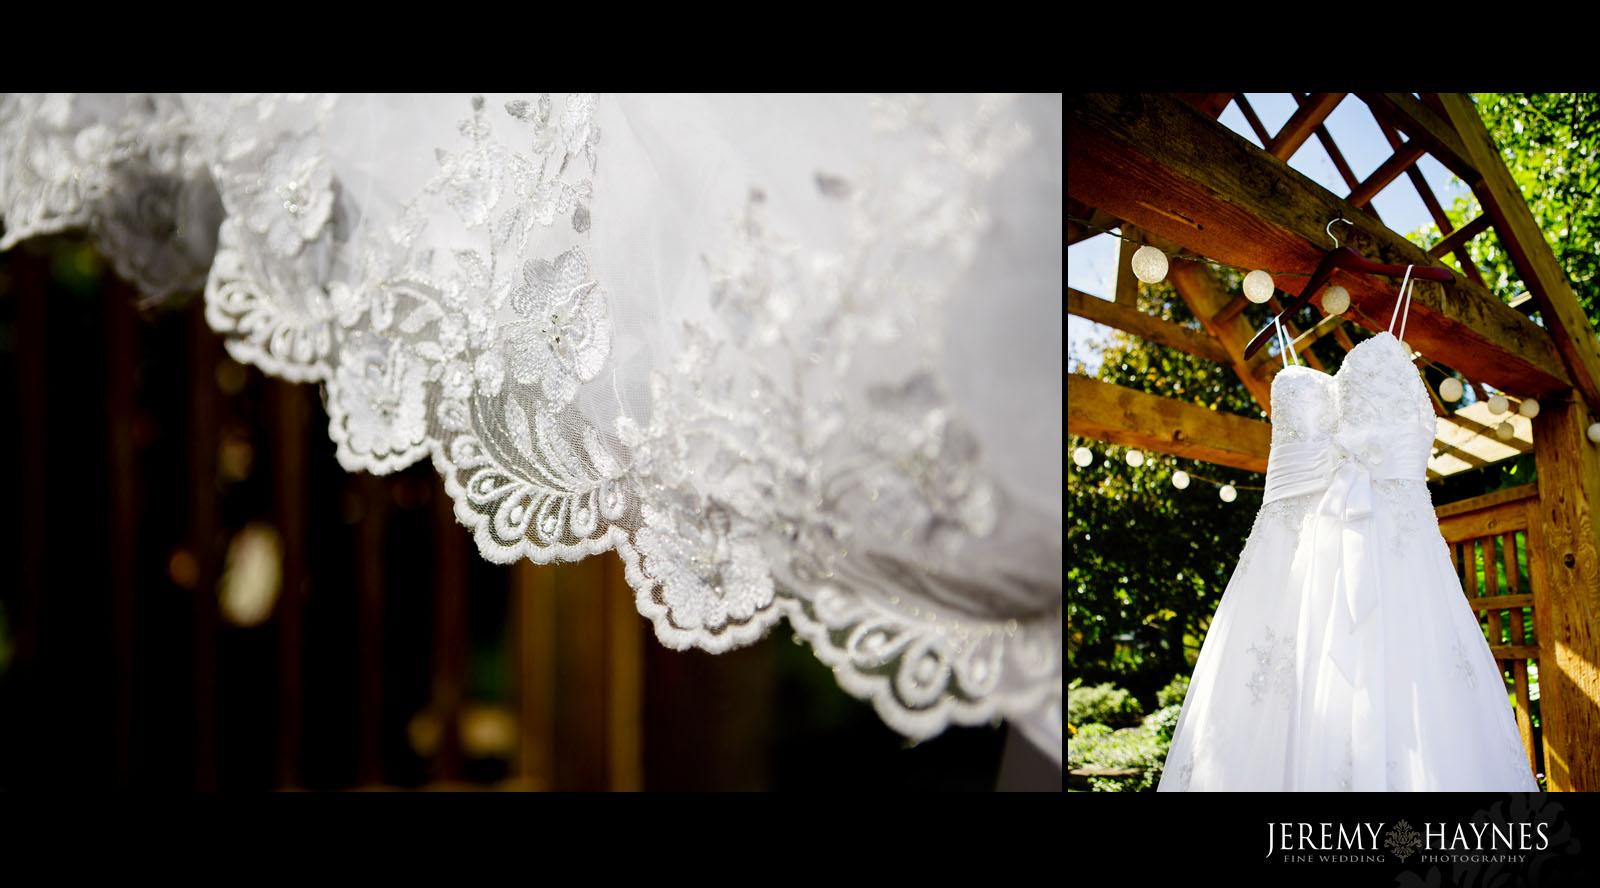 pretty-wedding-dress-bridal-avon-gardens-wedding-jeremy-haynes-photography.jpg